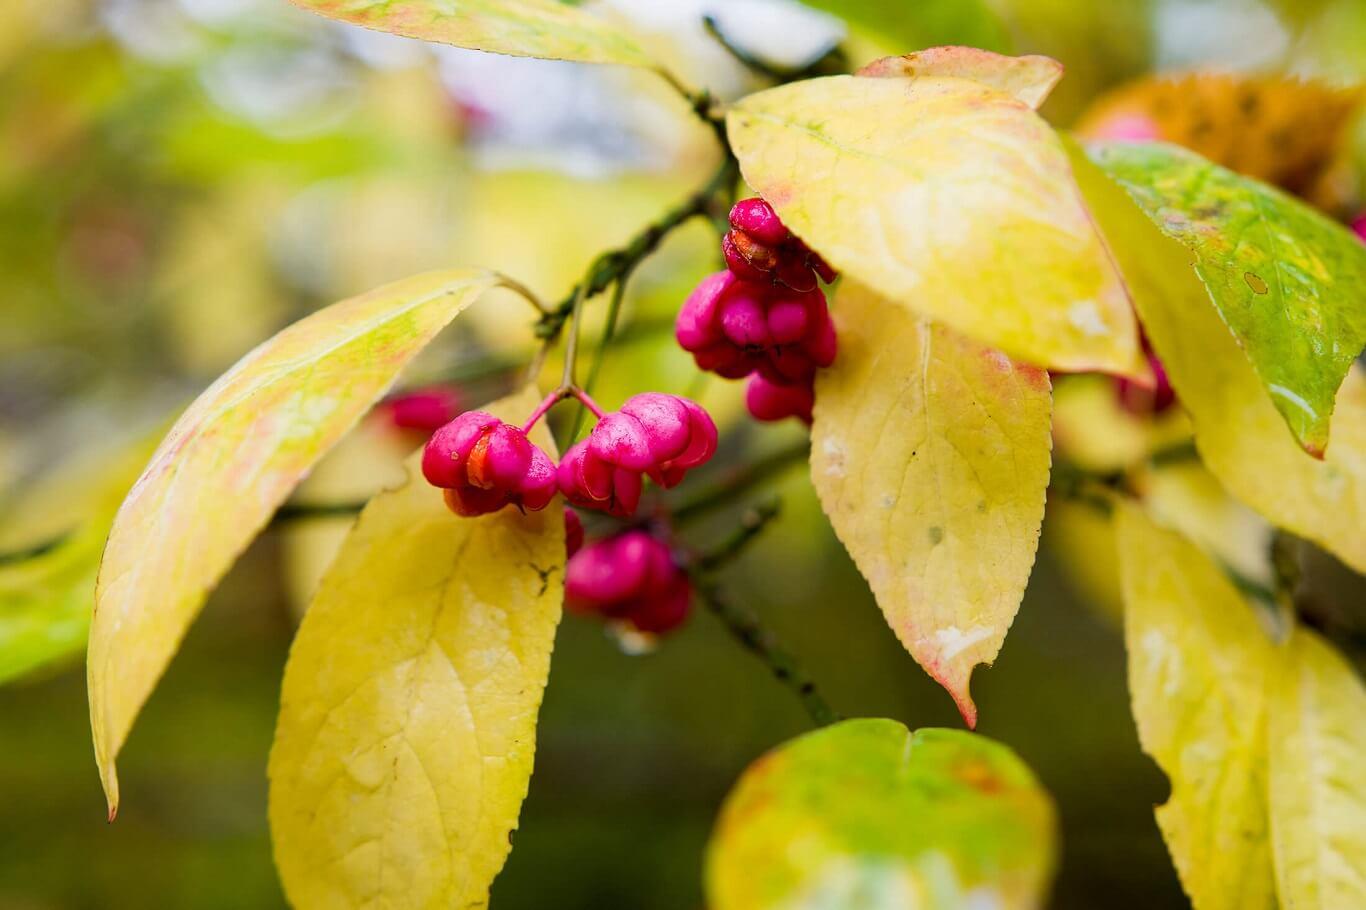 fruit of the poisonous tree doctrine.